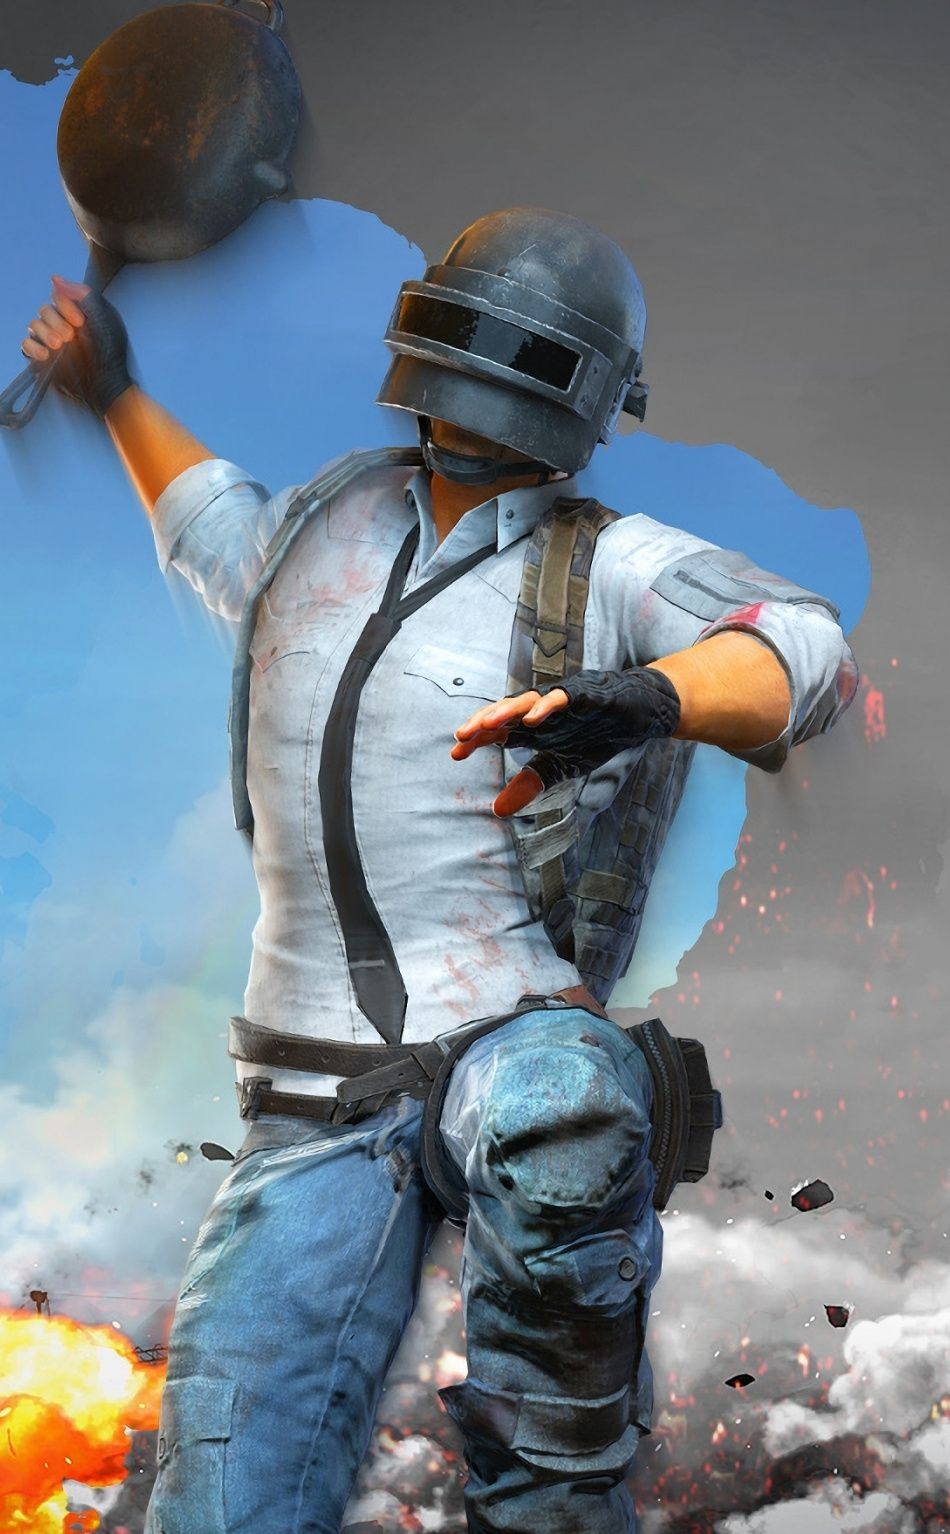 2018 Fan Art Pubg Video Game Artwork Helmet Guy 950x1534